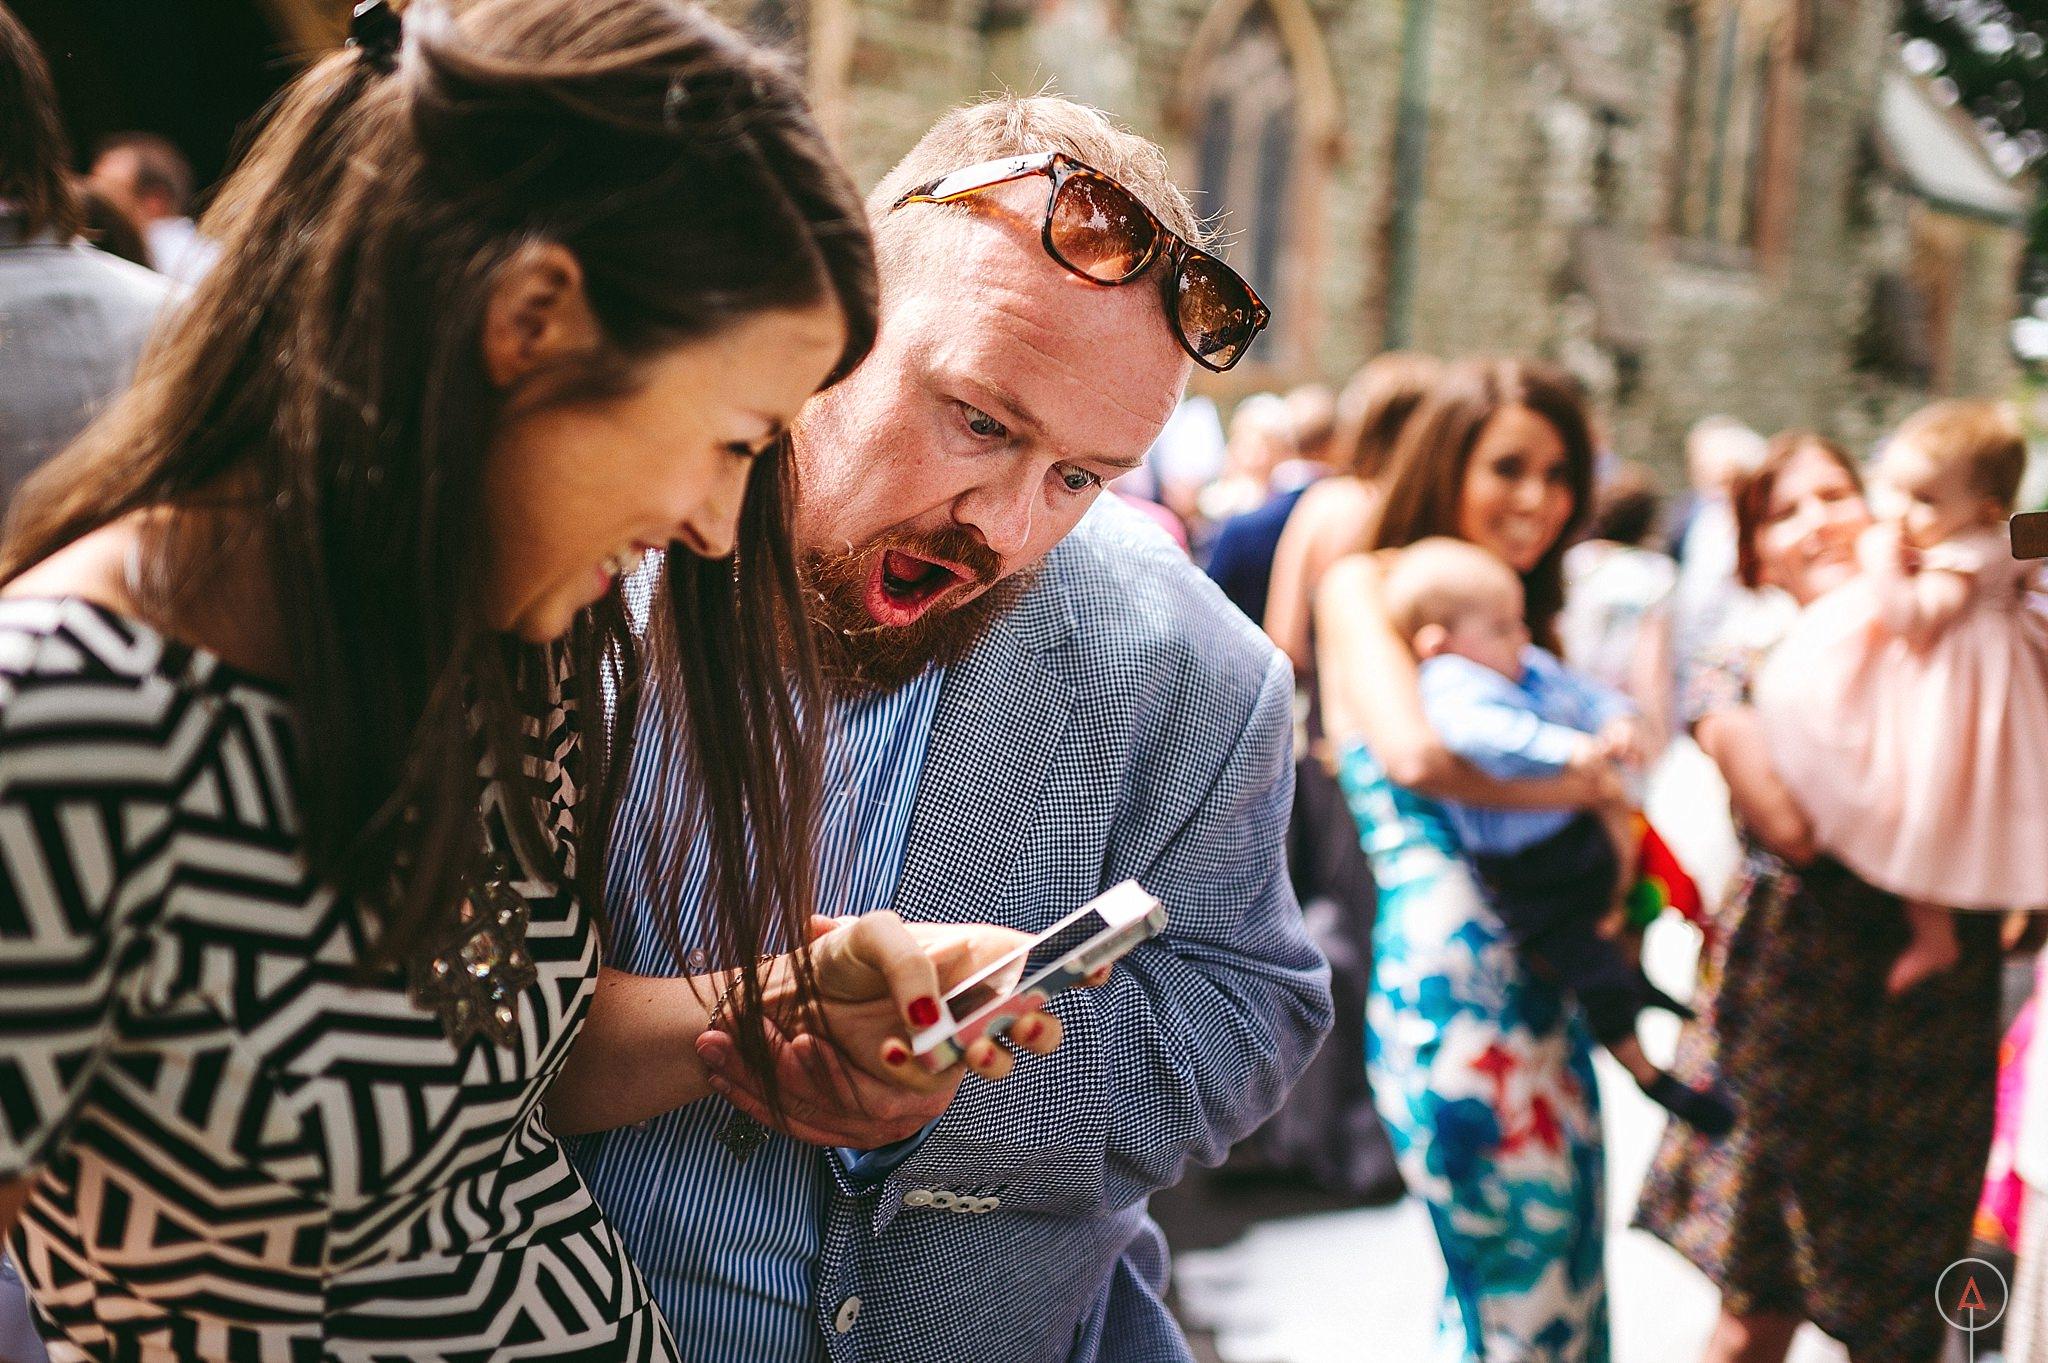 cardiff-wedding-photographer-aga-tomaszek_0371